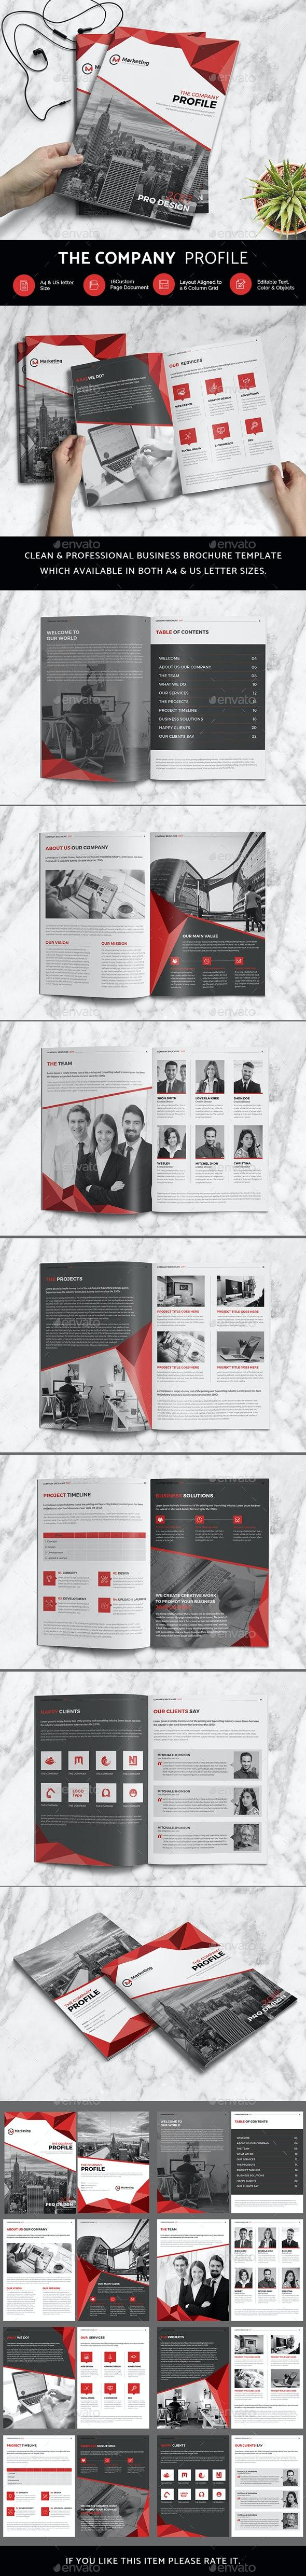 The Company Profile - Stationery Print Templates